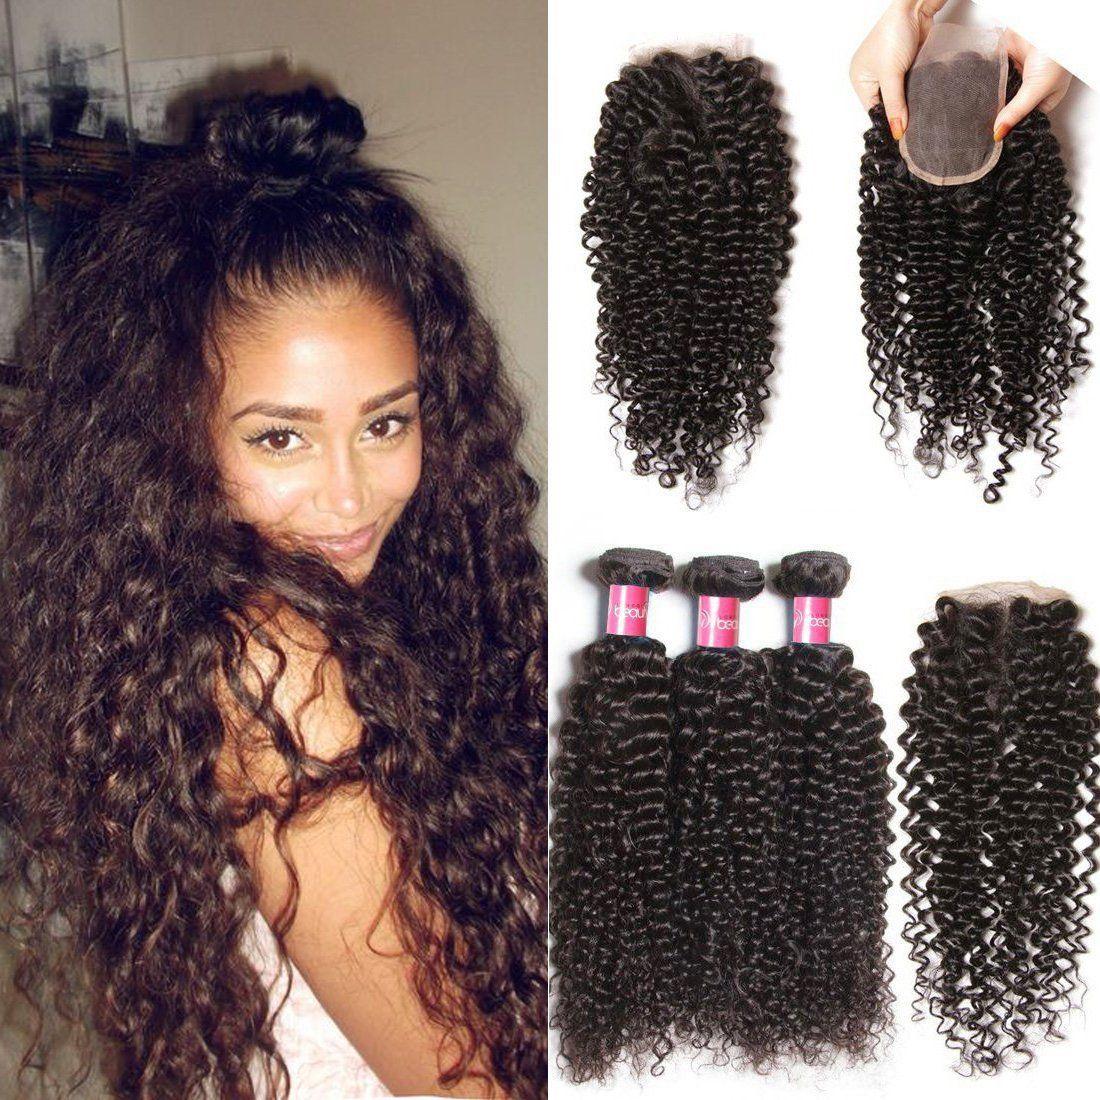 Longqi Beauty Brazilian Unprocessed Curly Virgin Human Hair Weave 3